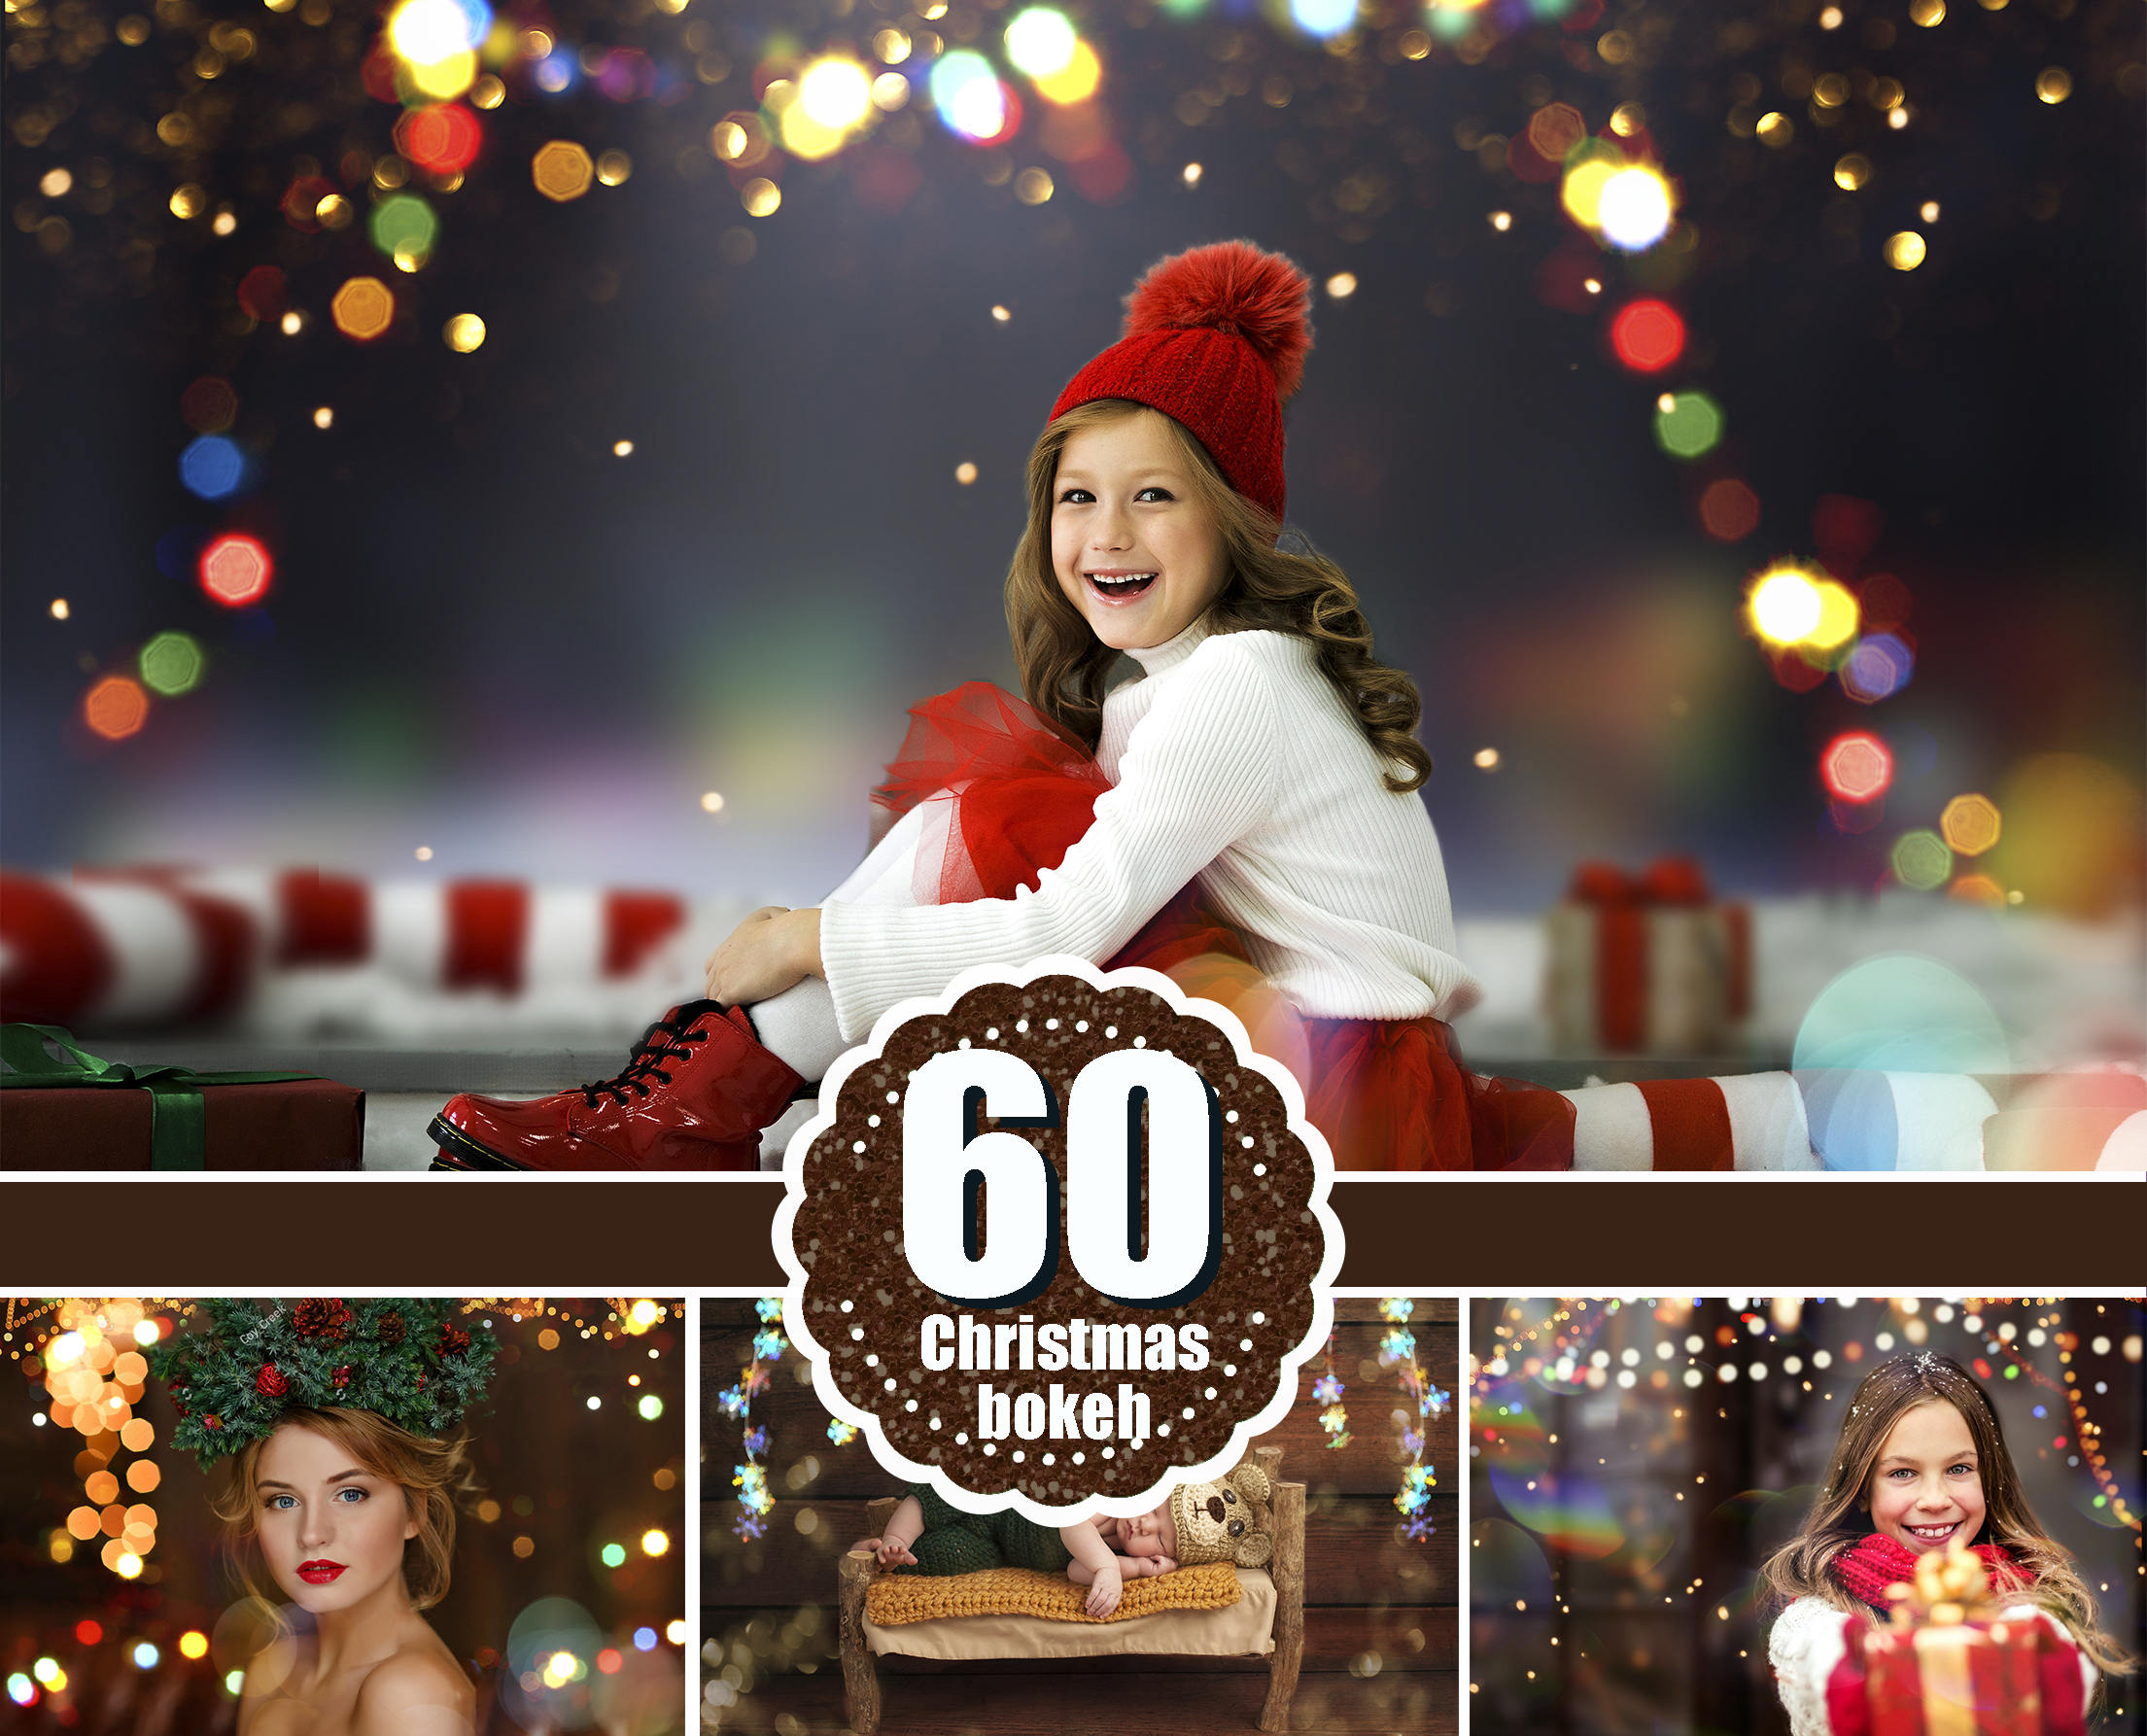 60 Christmas Bokeh Light Overlays, Digital Backdrop, Digital Background,  Holiday Wedding Lights, Photoshop overlay, gold light, jpg file